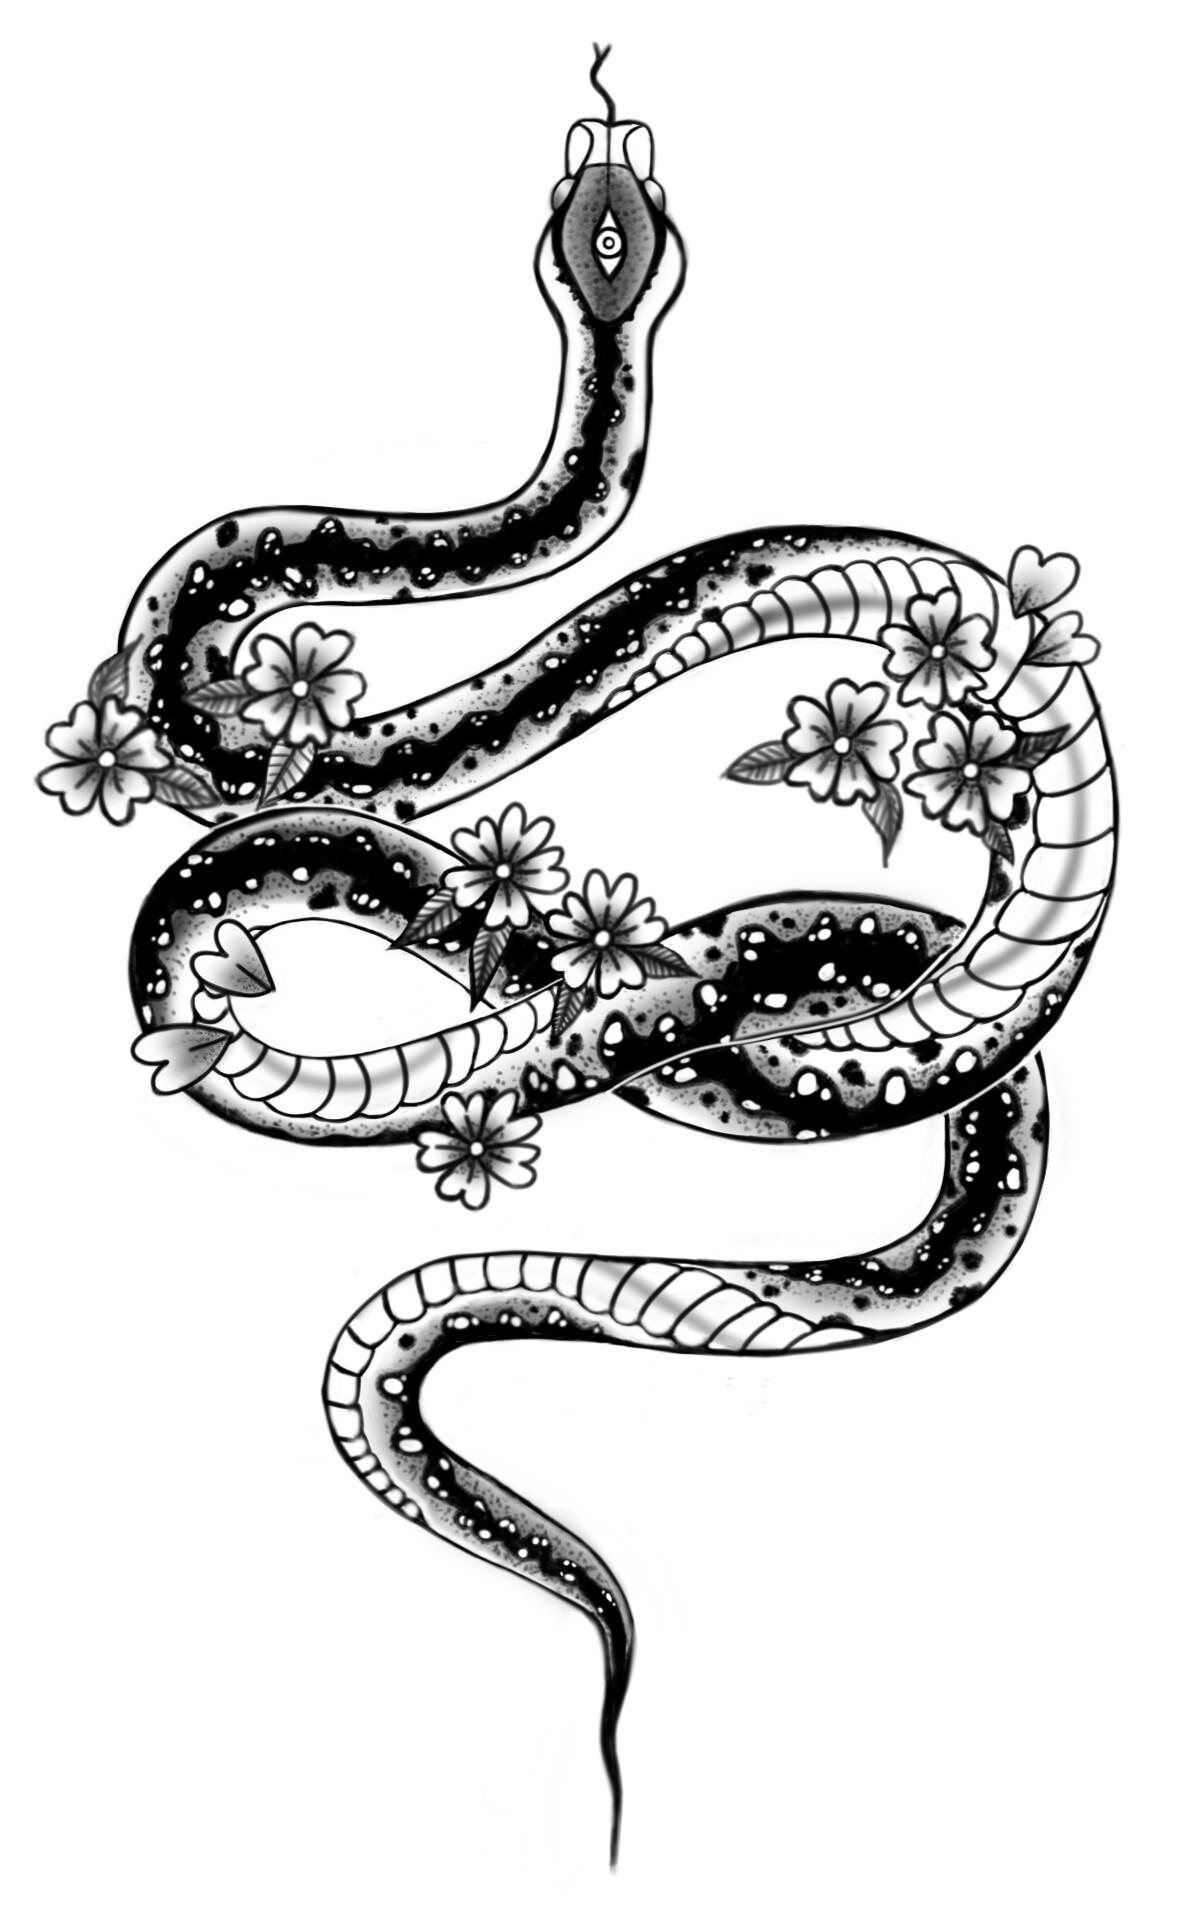 20e0ccde13ff4 ArtStation - Snake Tattoo Designs, Ellen Beuting